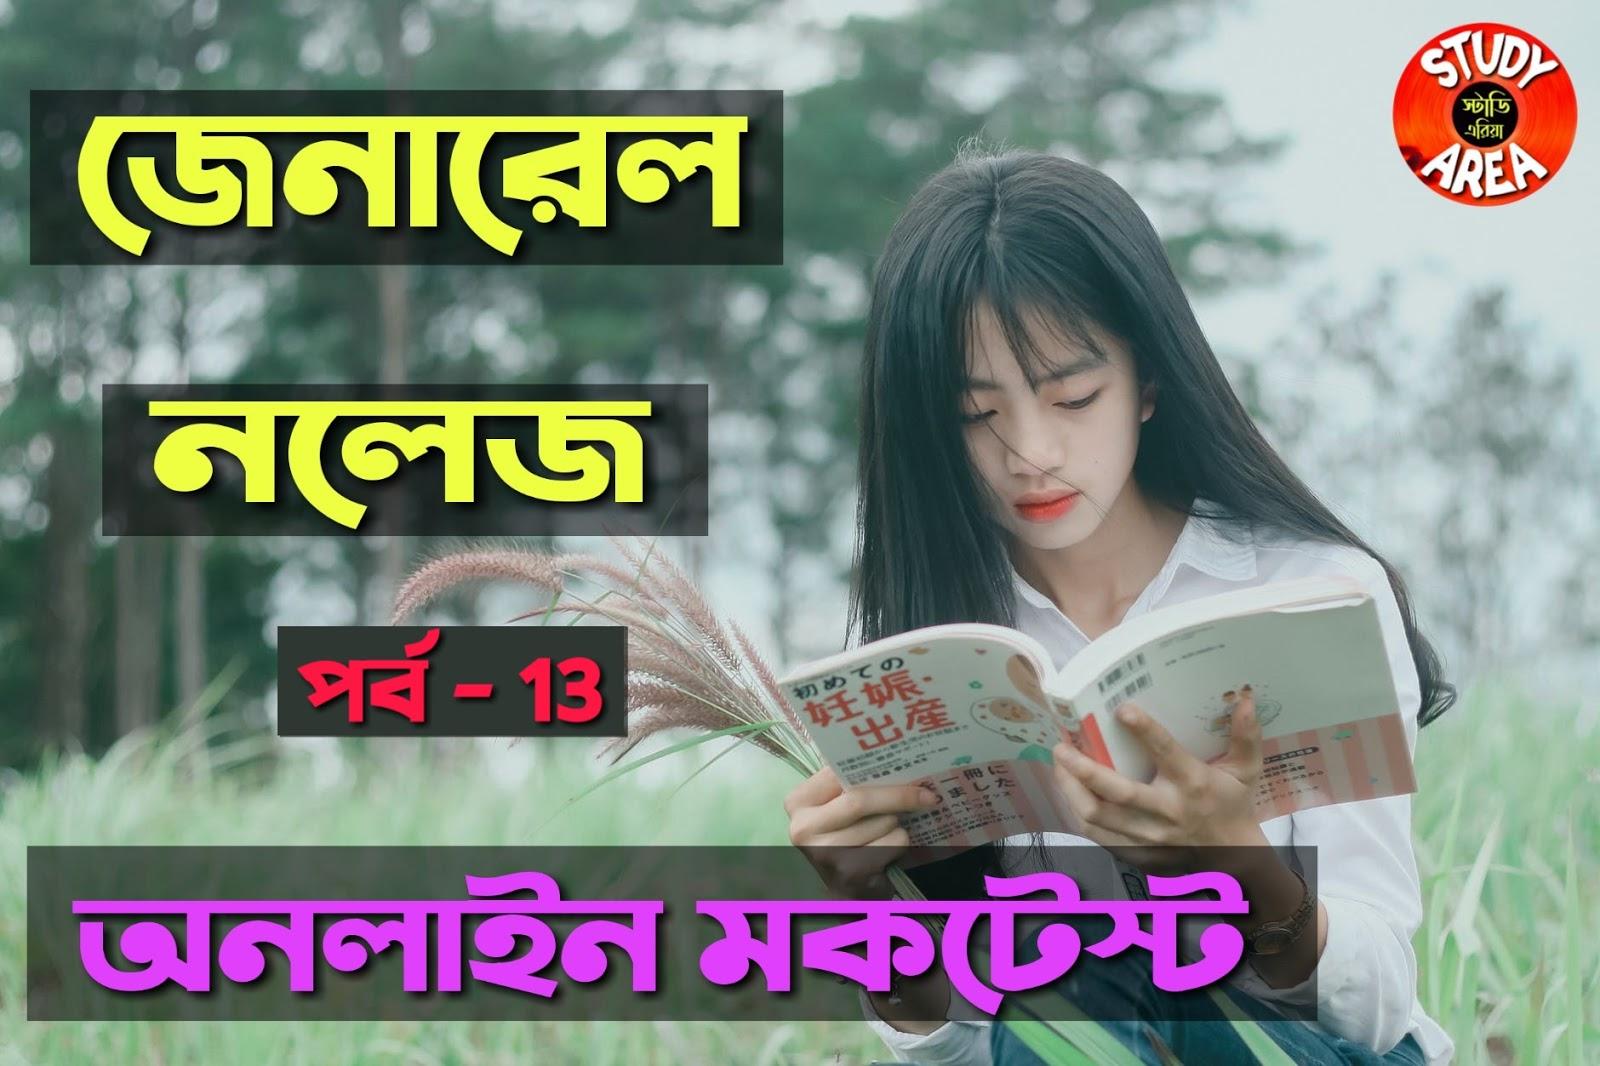 Gk Online Mock Test in Bengali - part -13